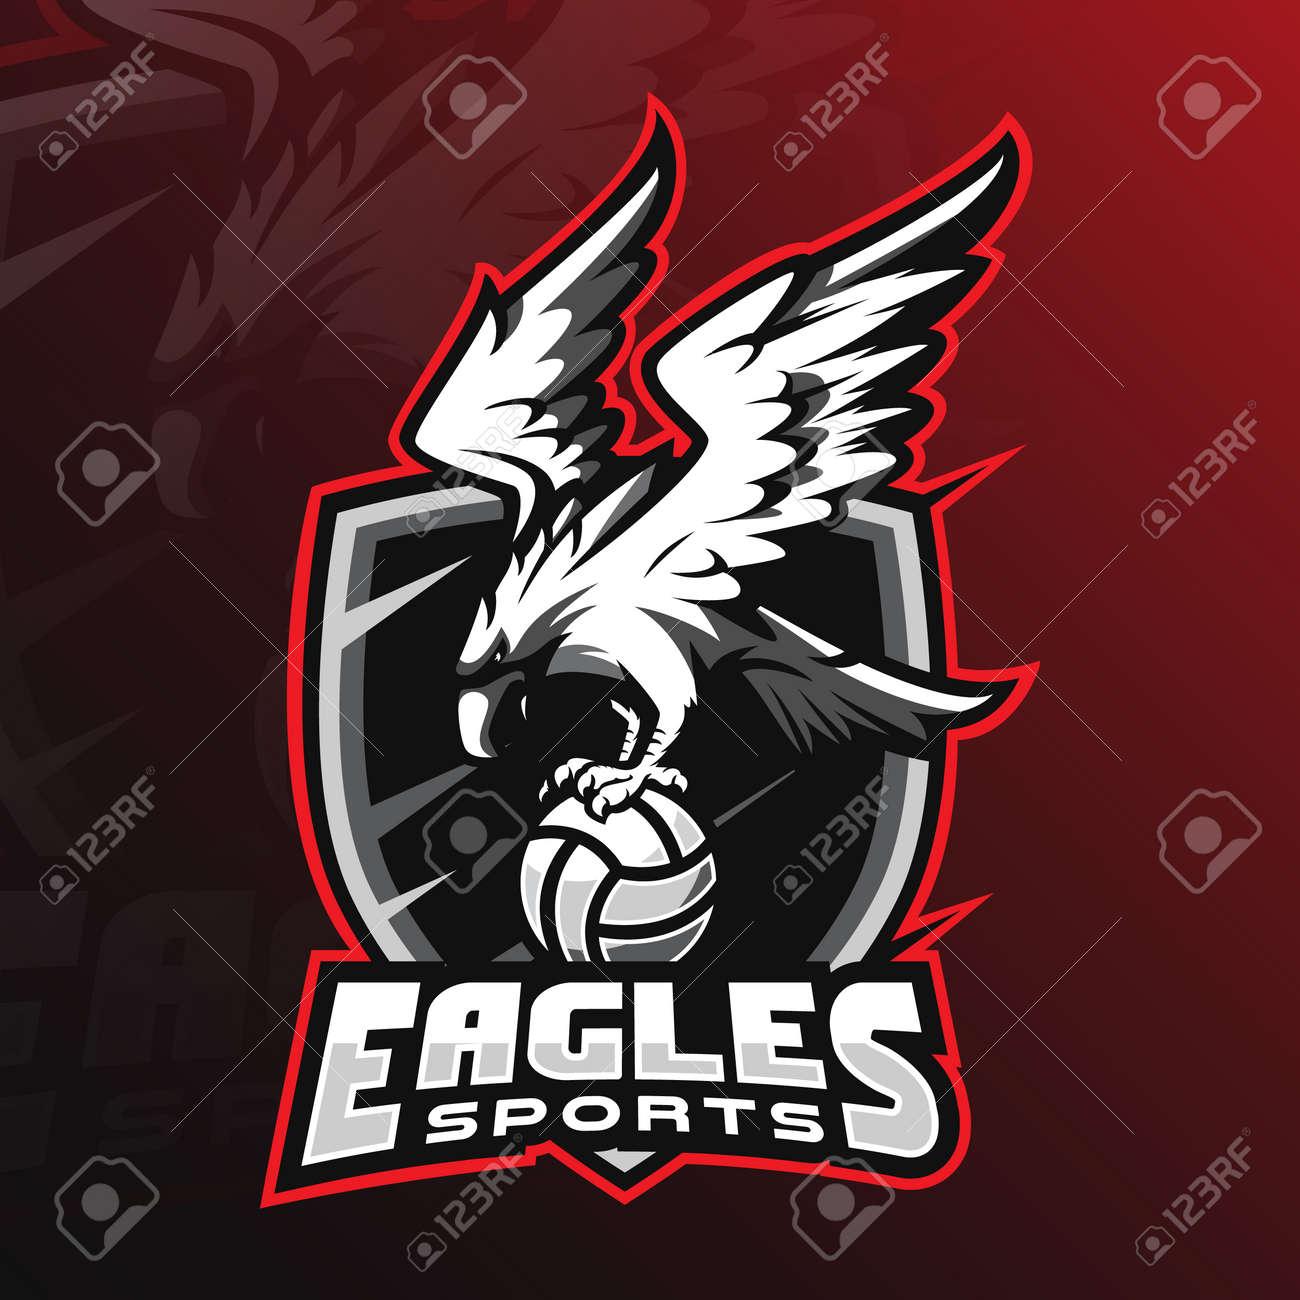 eagle vector mascot logo design with modern illustration concept